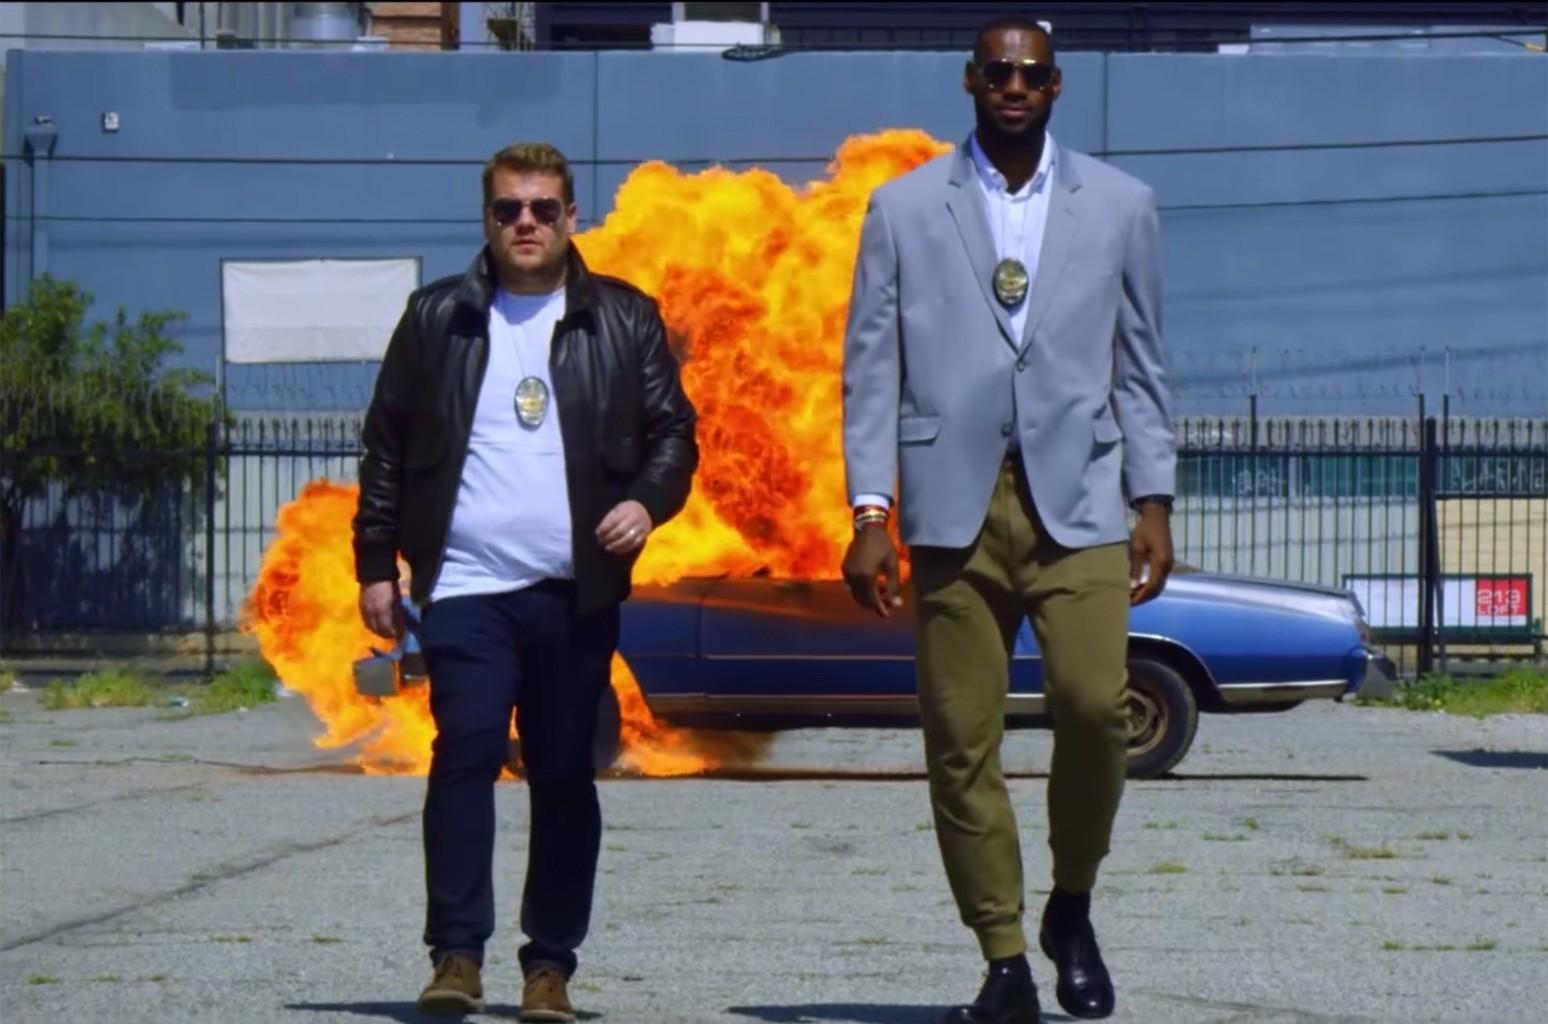 Lebron James and James Corden, Carpool Karaoke